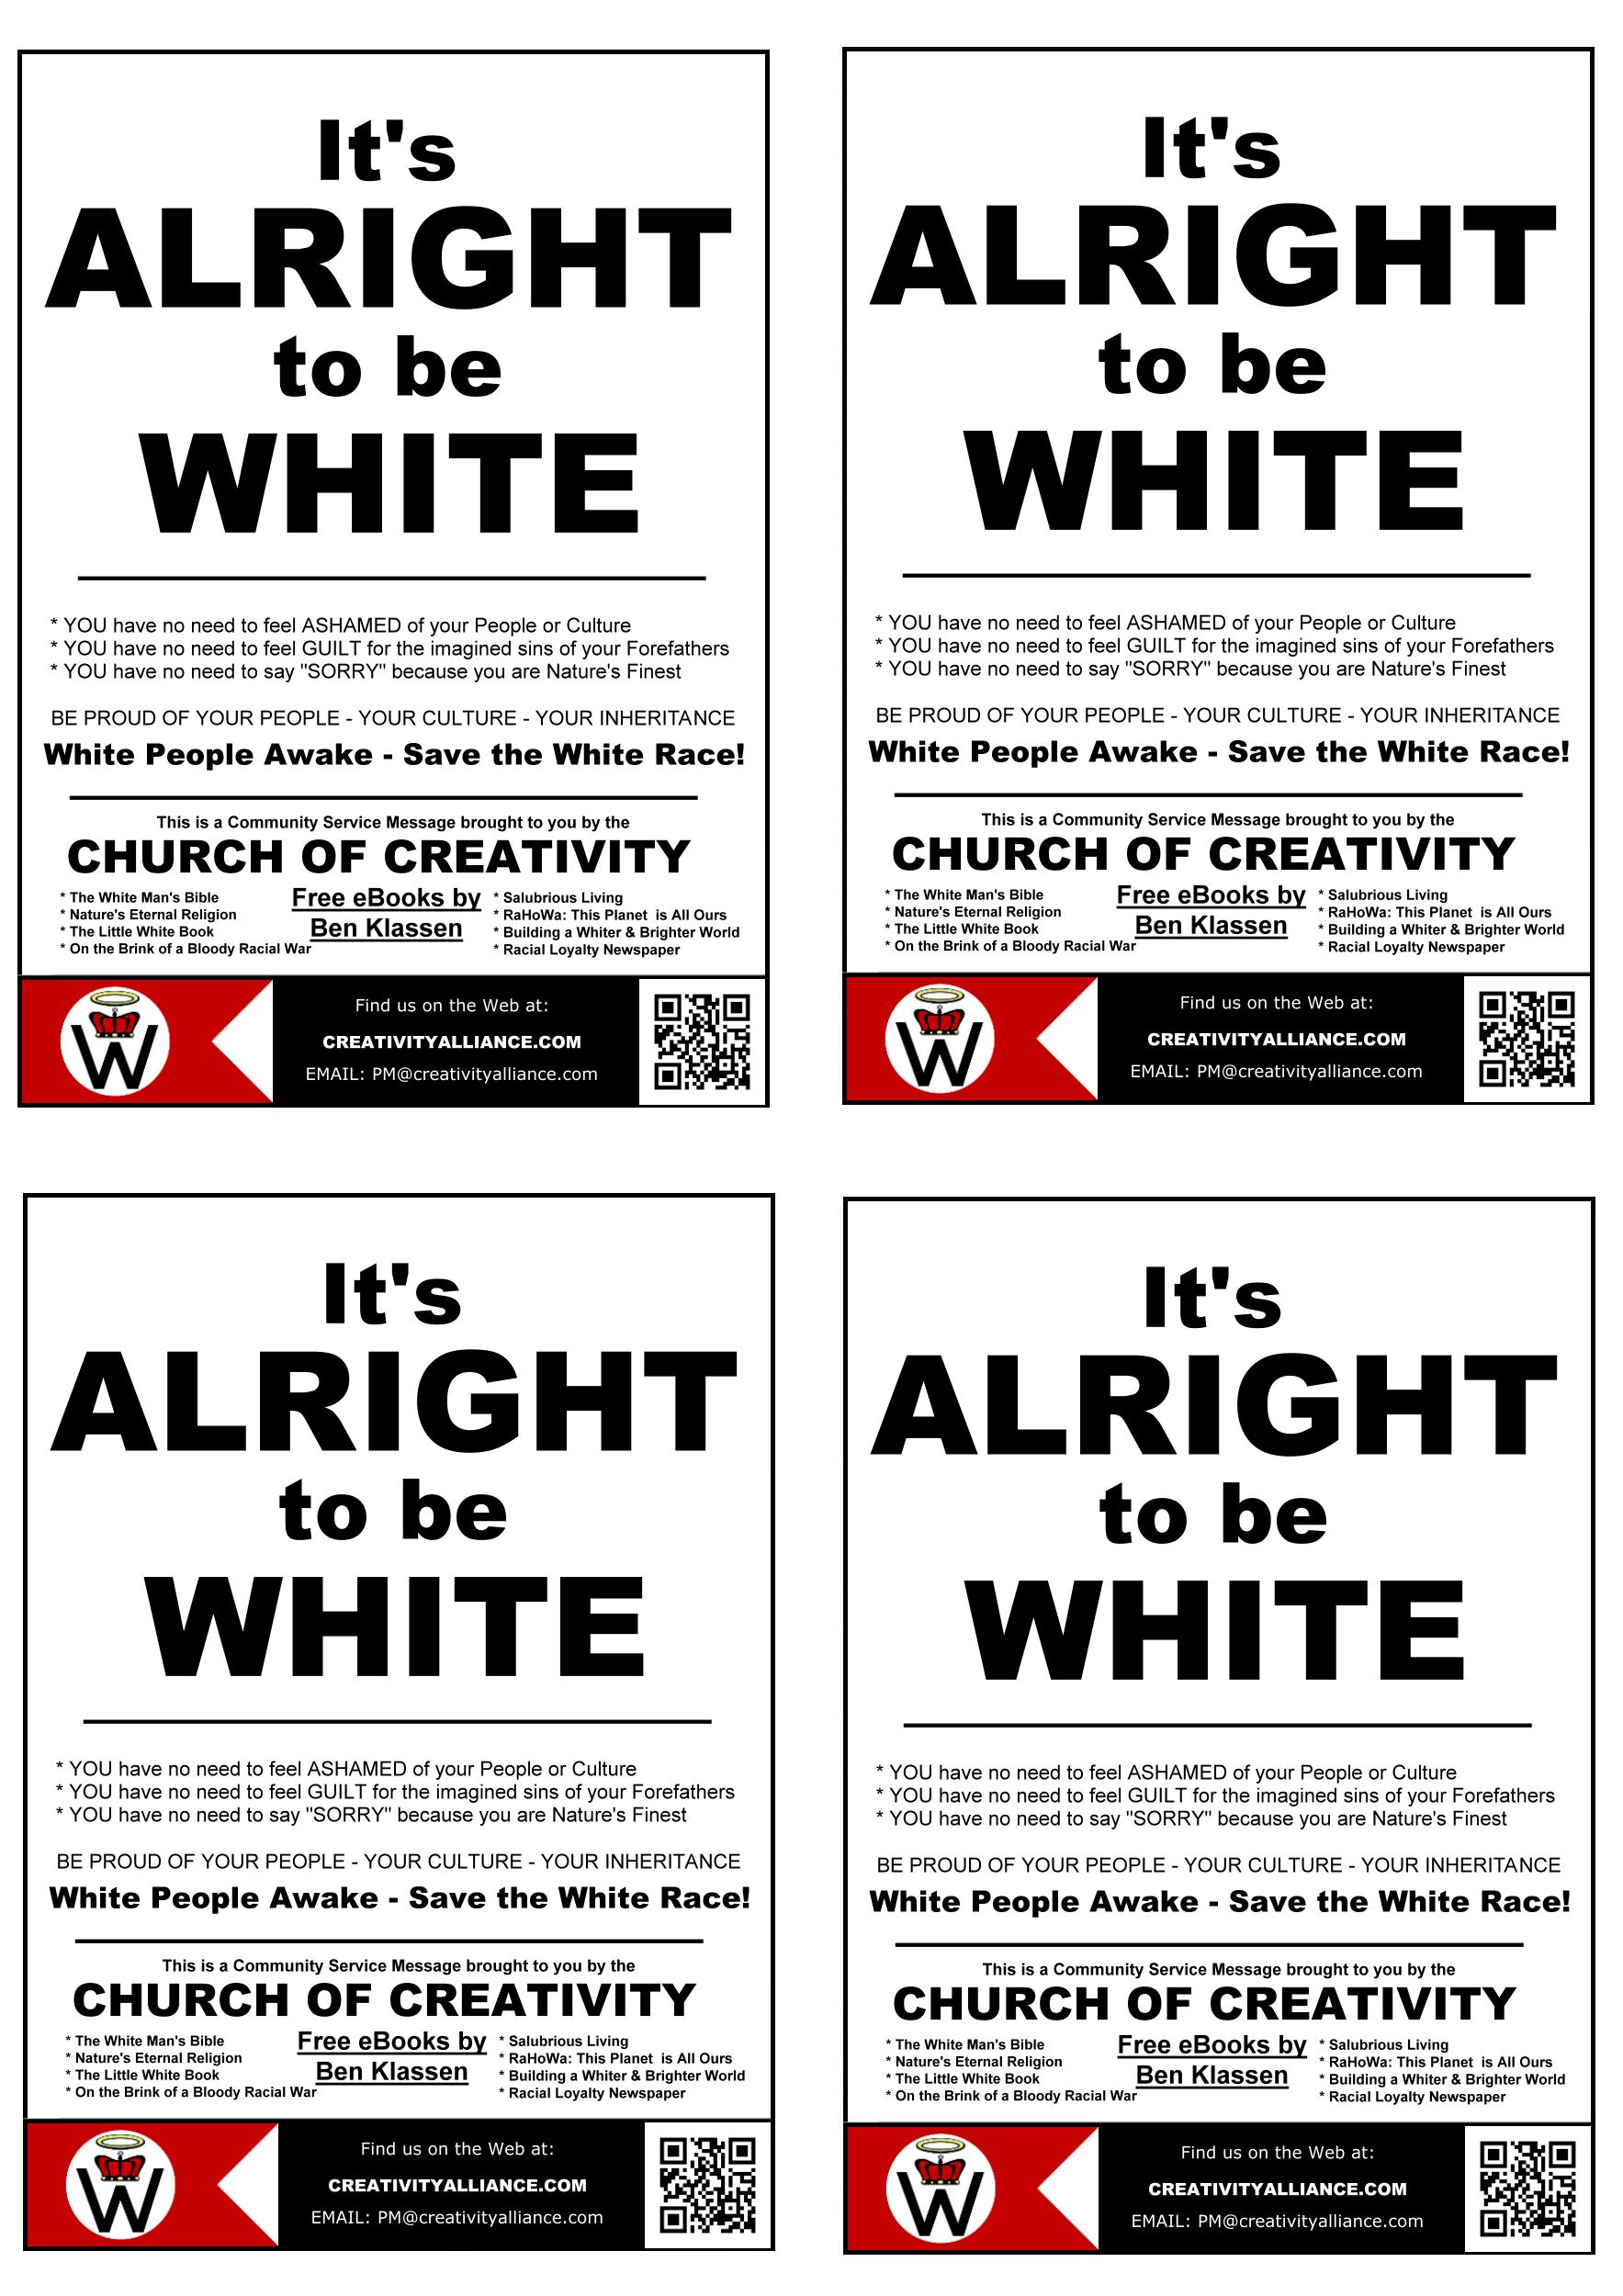 Creativity Alliance in an Australian Newspaper